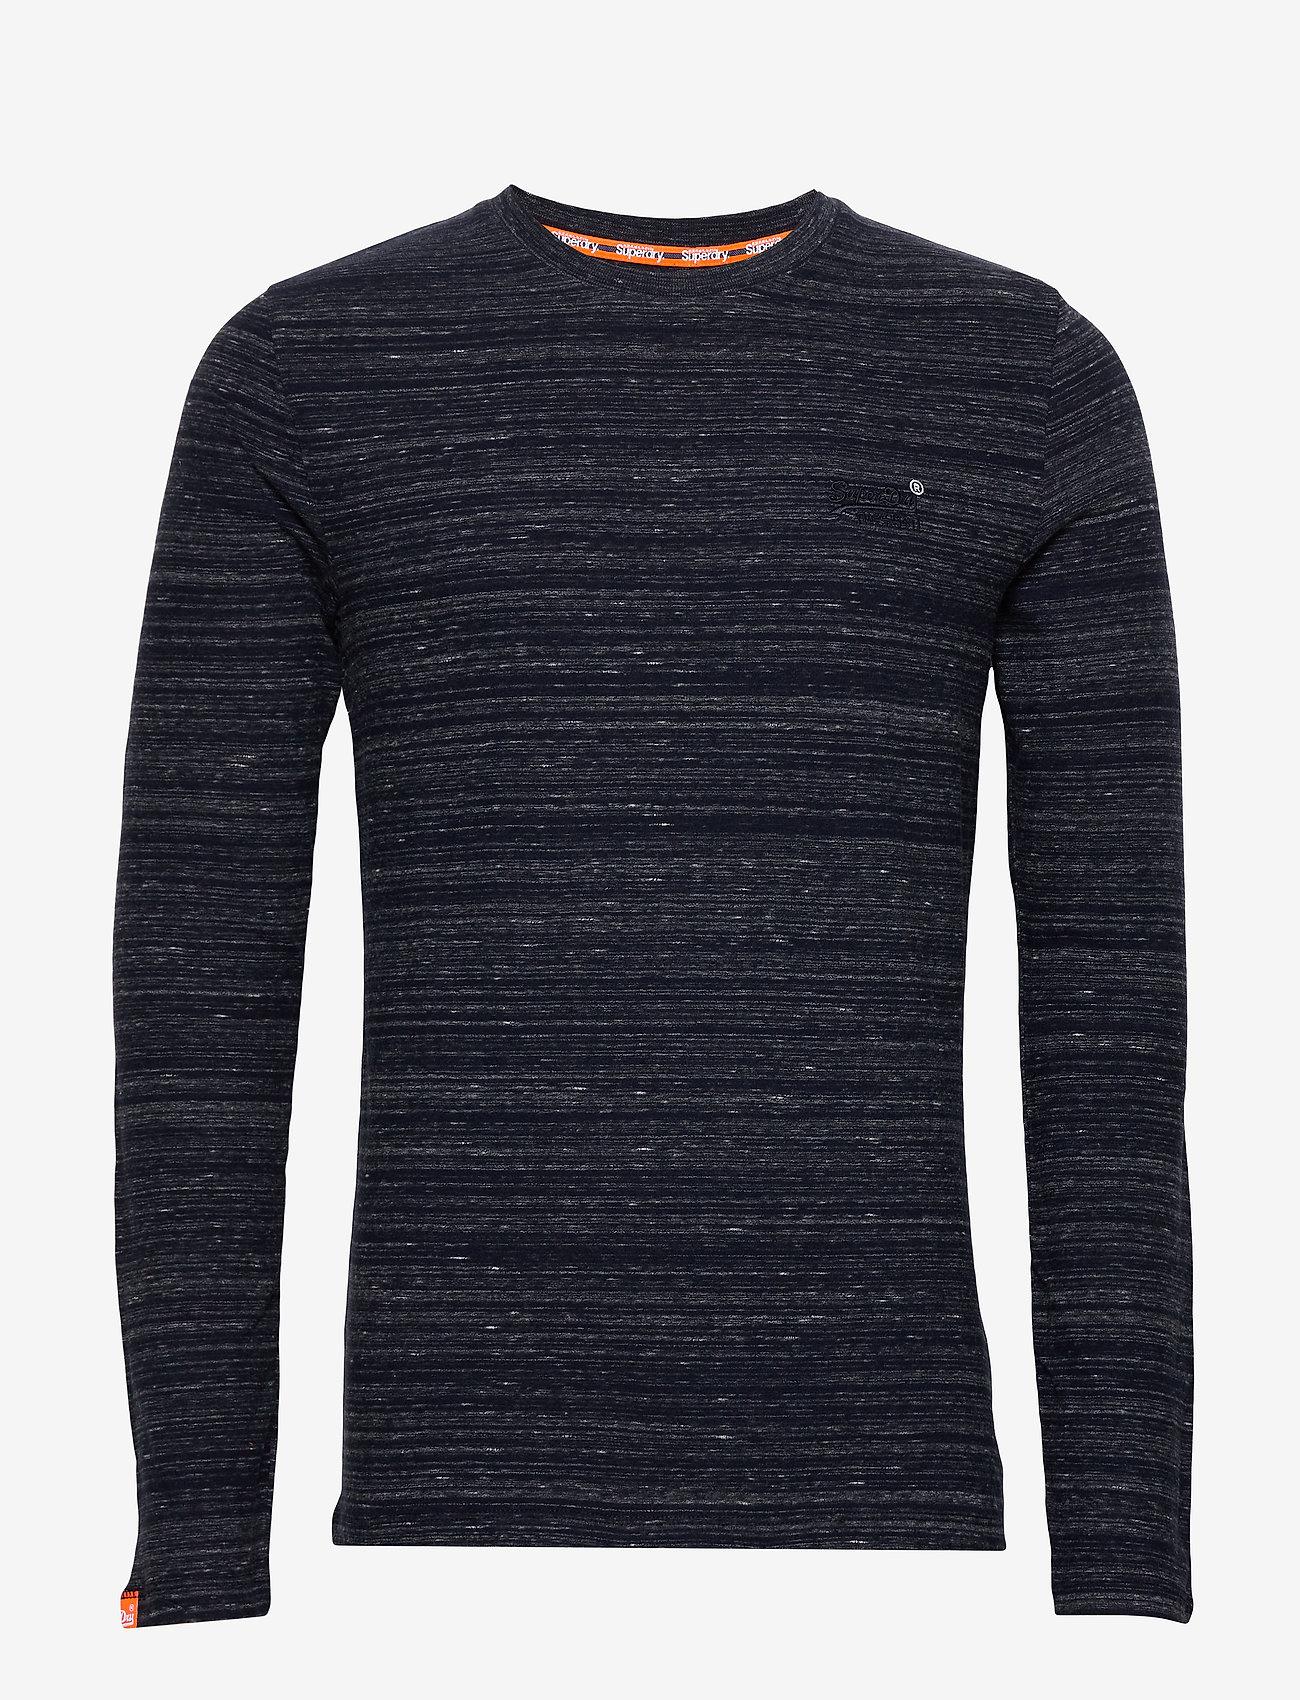 Superdry Ol Vintage Emb Ls Top - T-shirts MIDNIGHT NAVY SPACE DYE KbI4FiFw